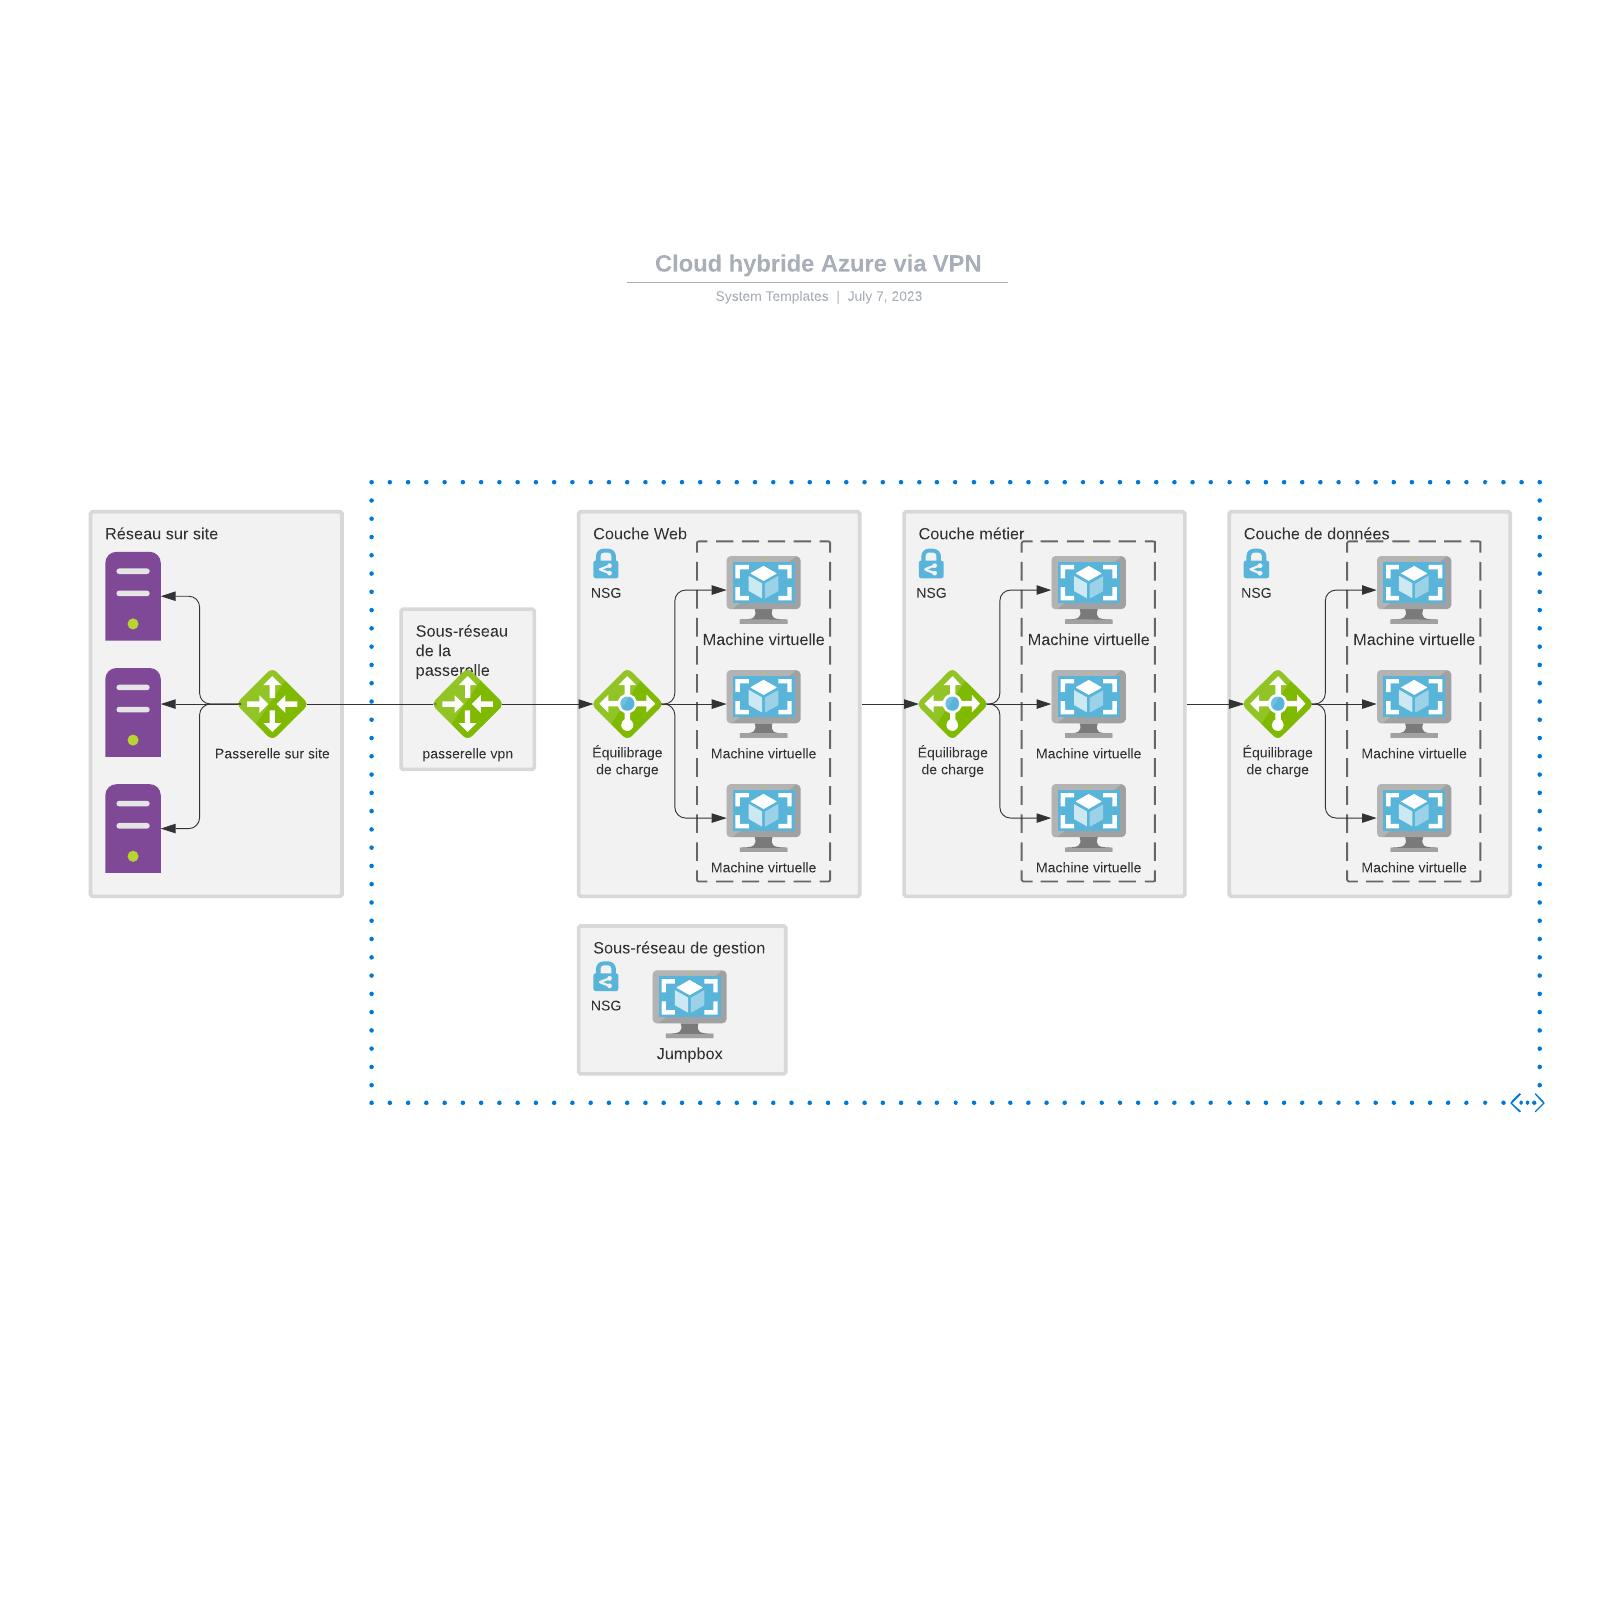 exemple de Cloud hybride Azure via VPN